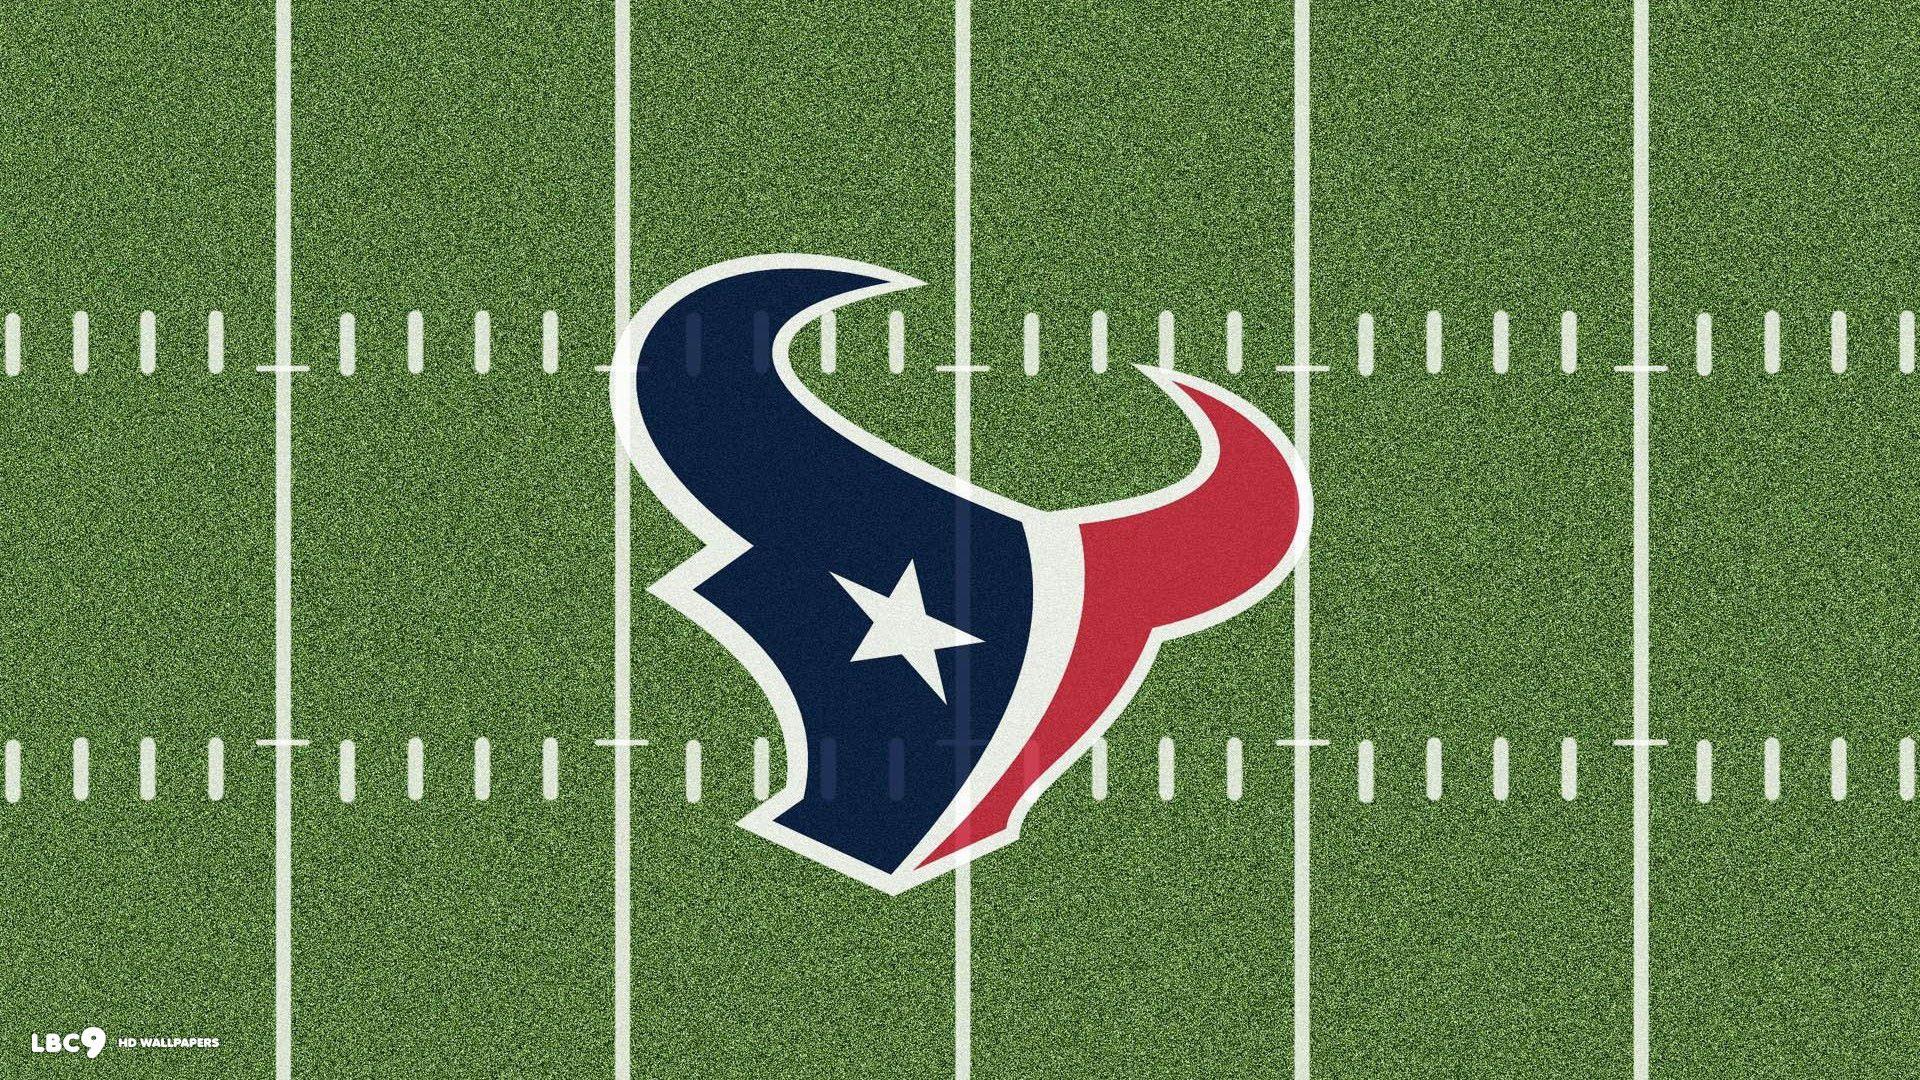 Houston texans logo google search